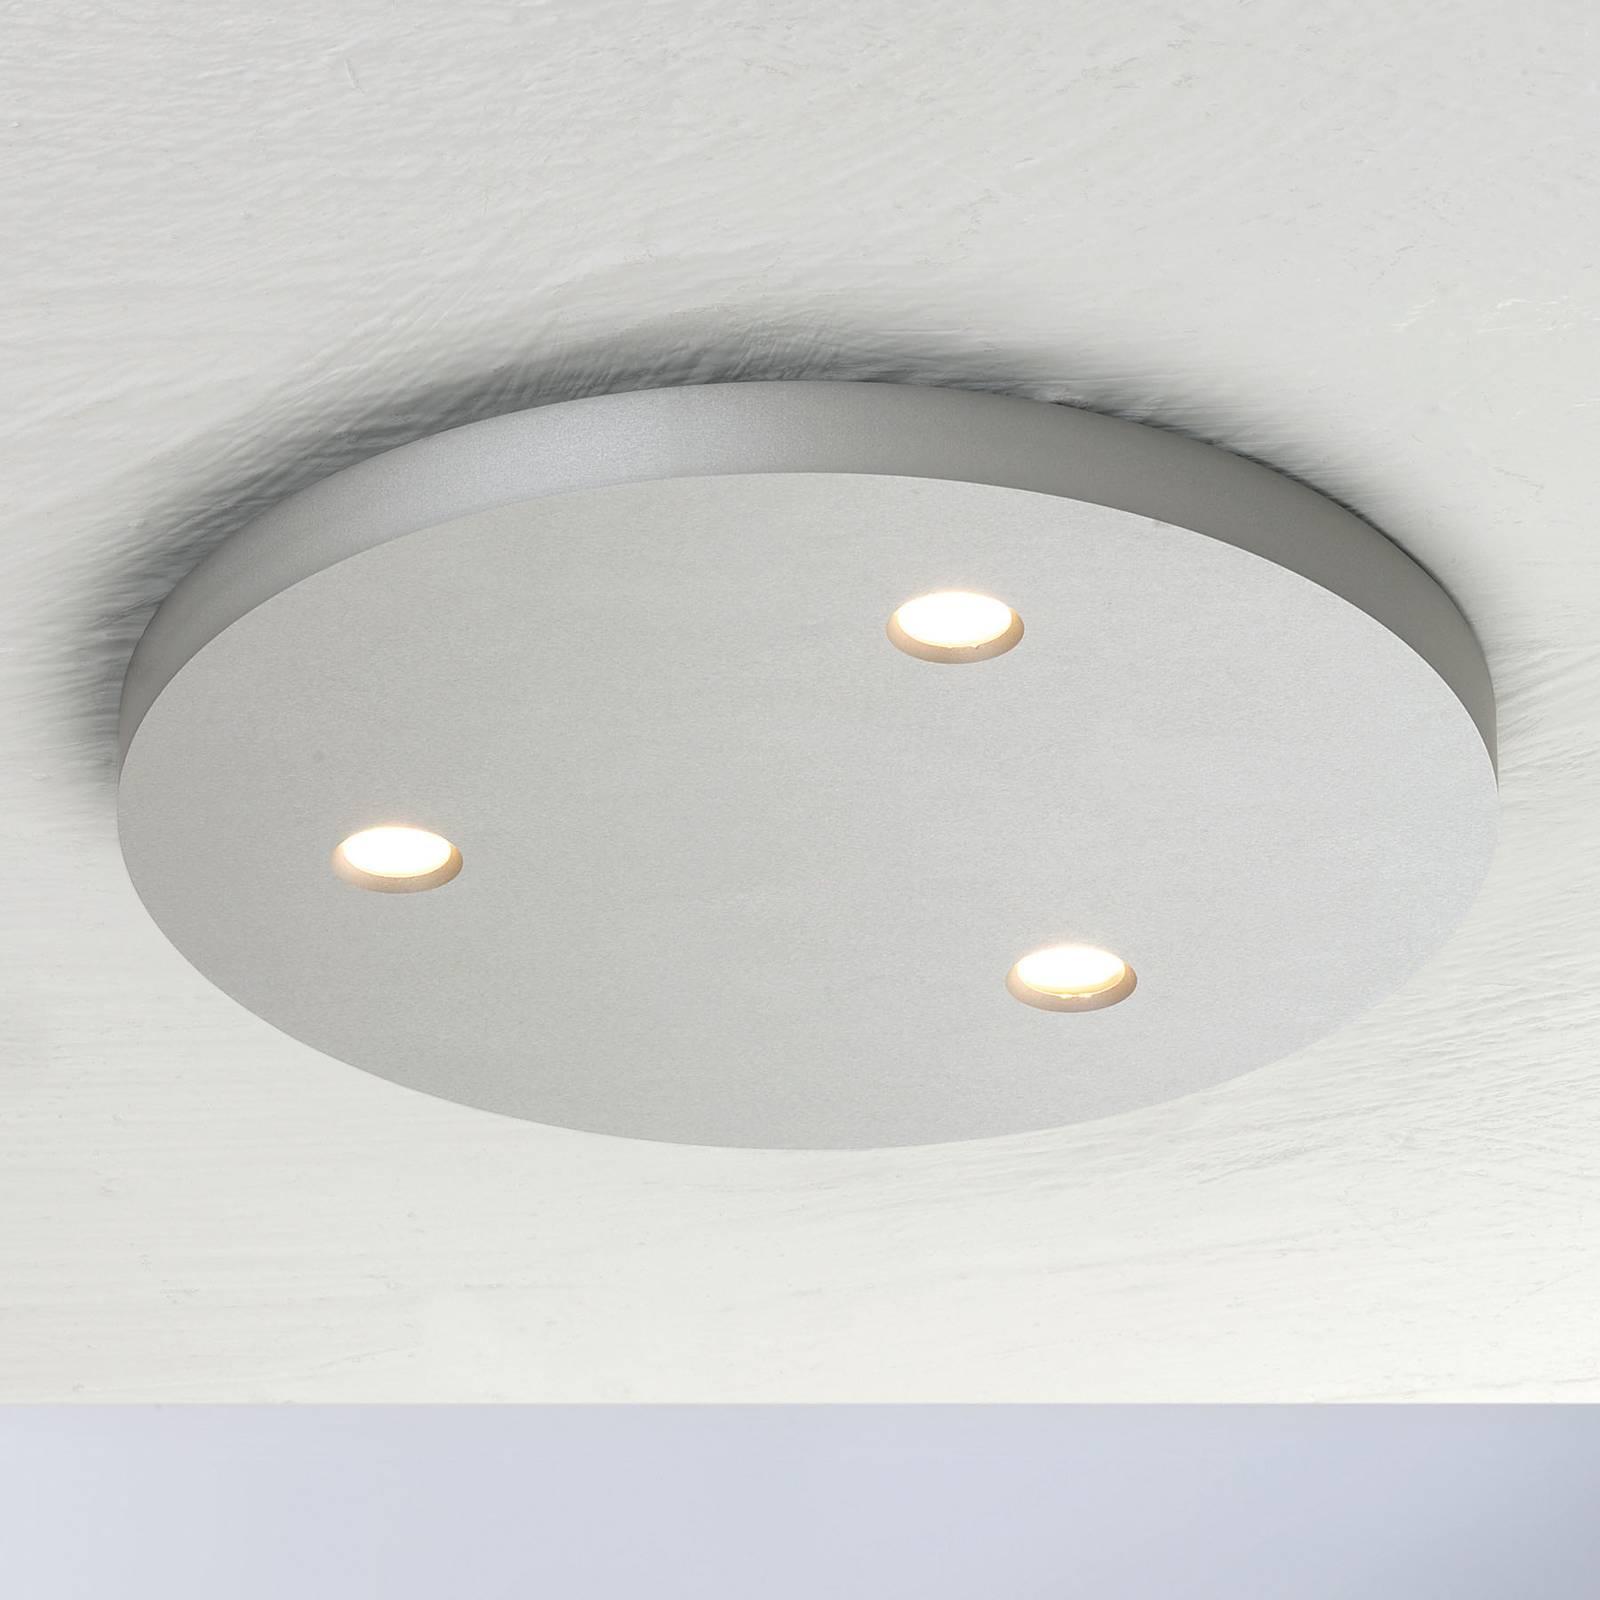 Bopp Close LED plafondlamp 3-lamps rond alu